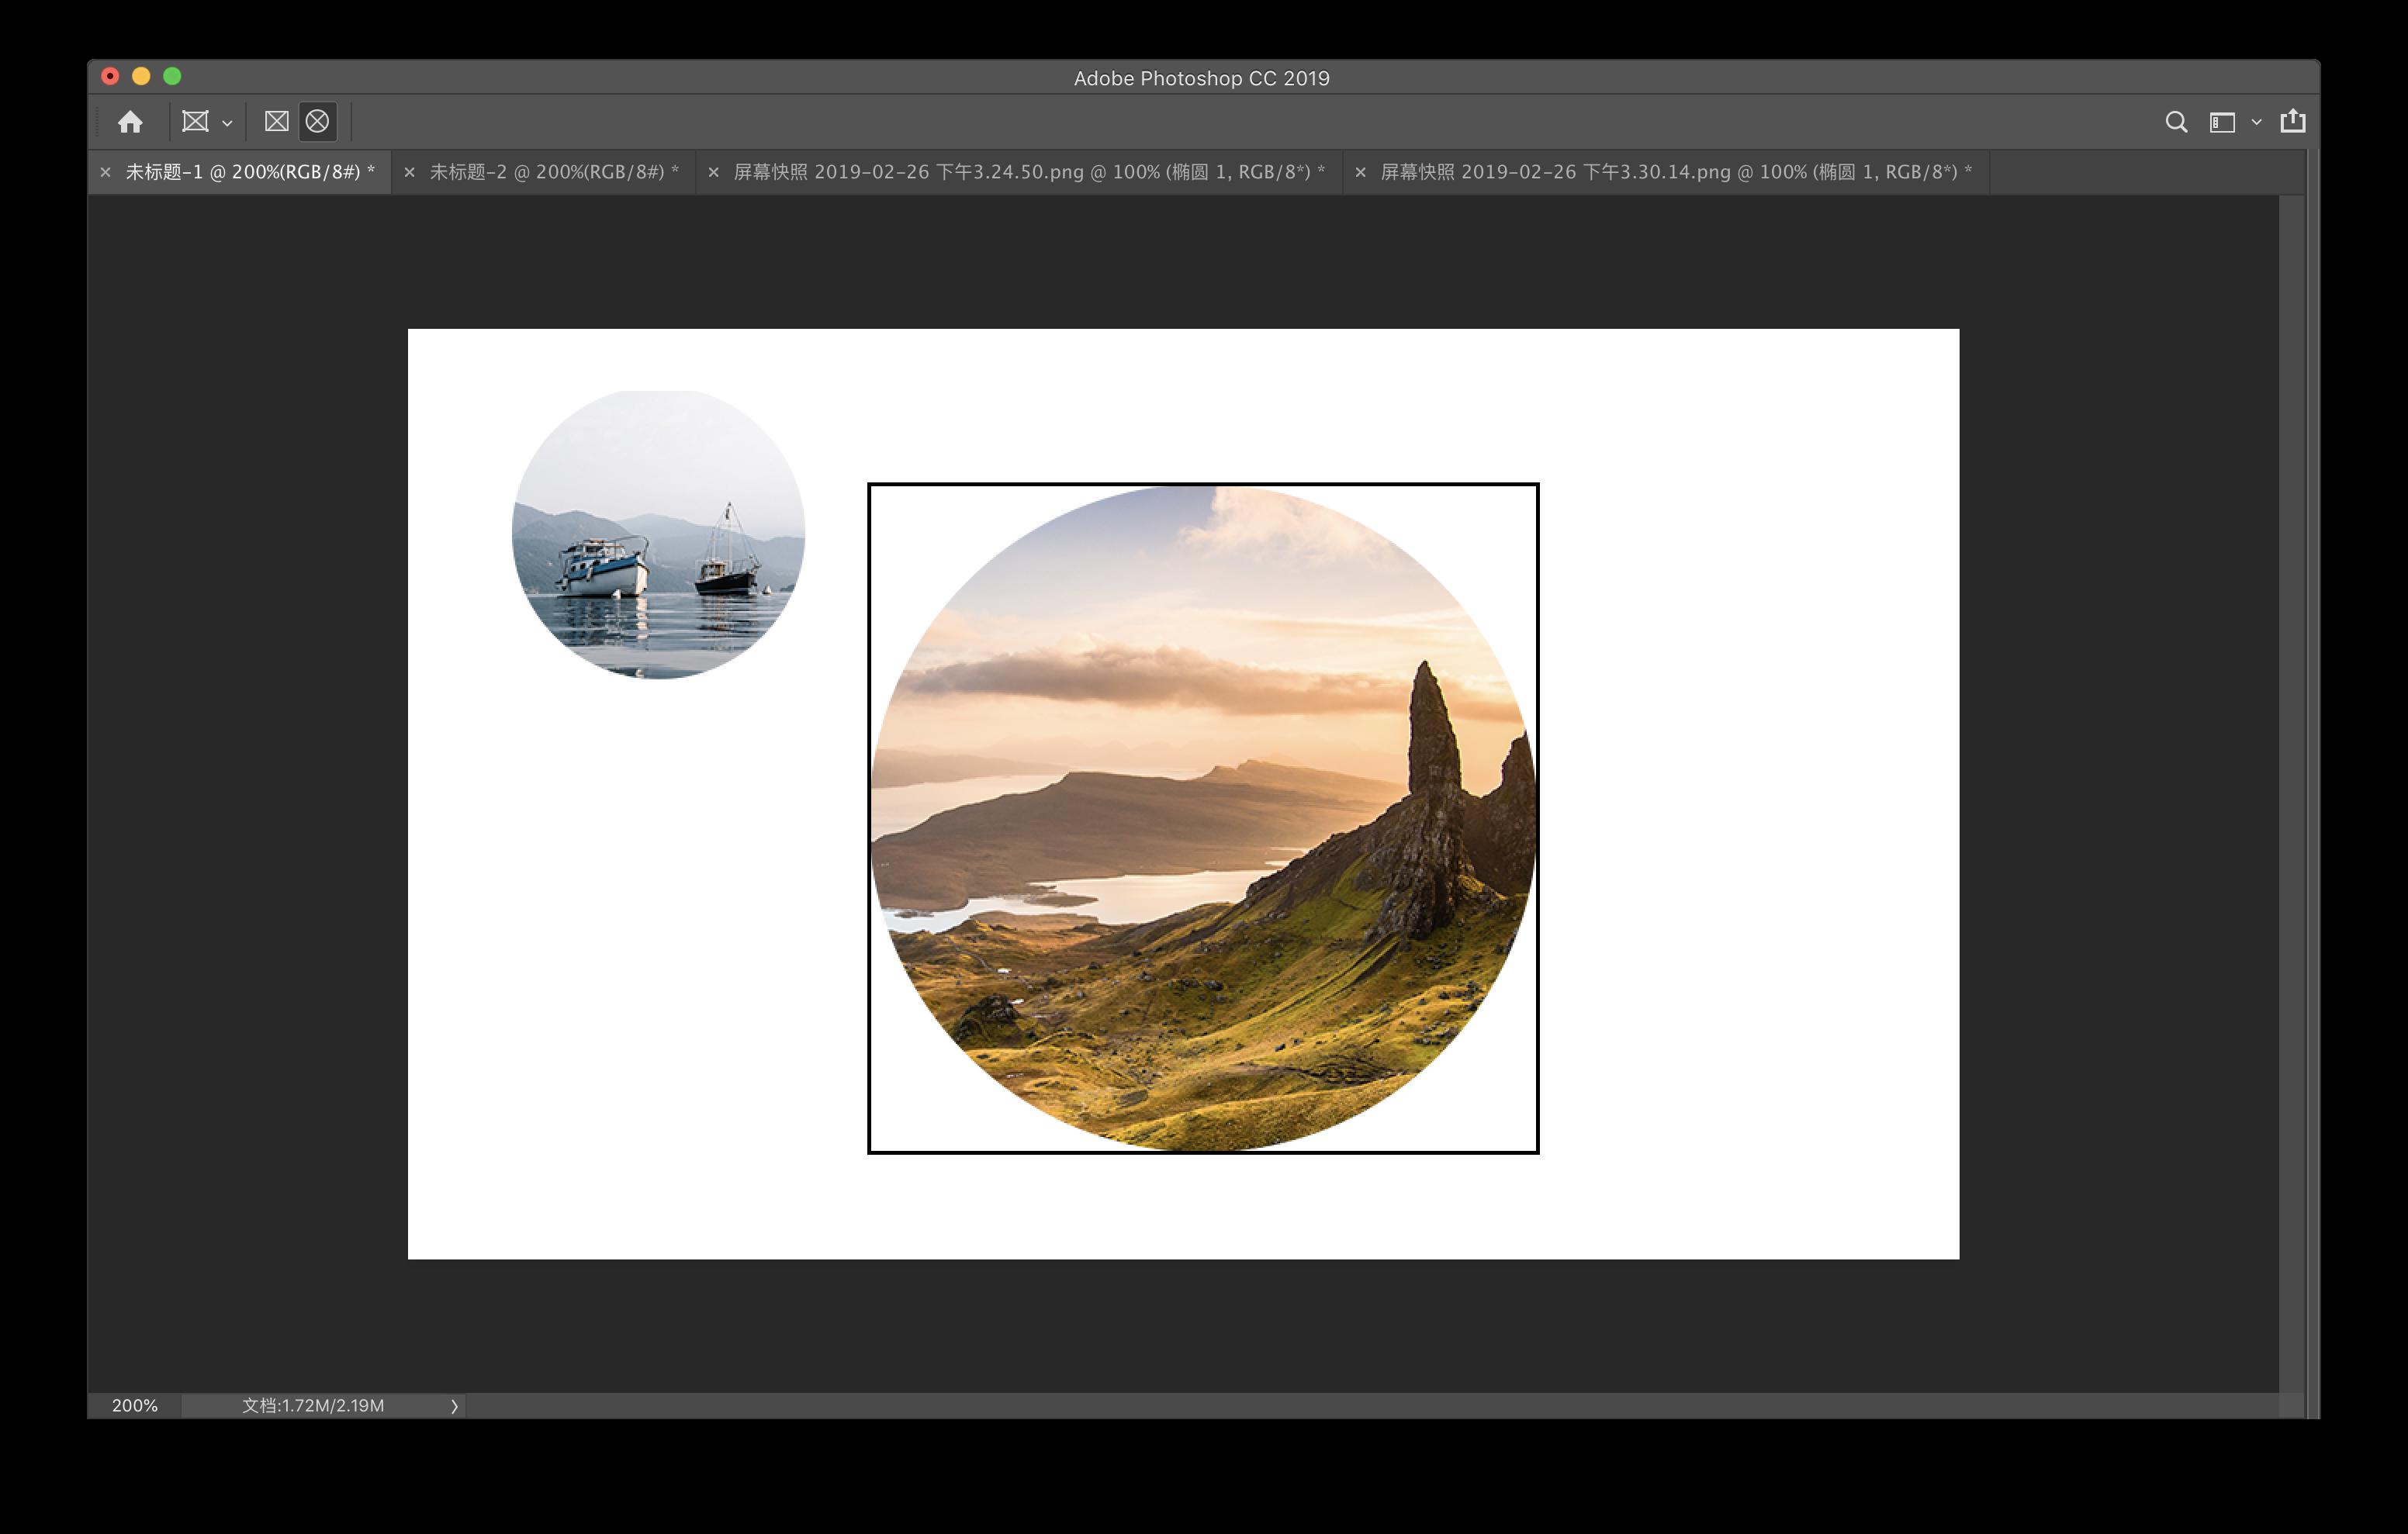 ps2019新功能图框工具的用途!简单实用!图片